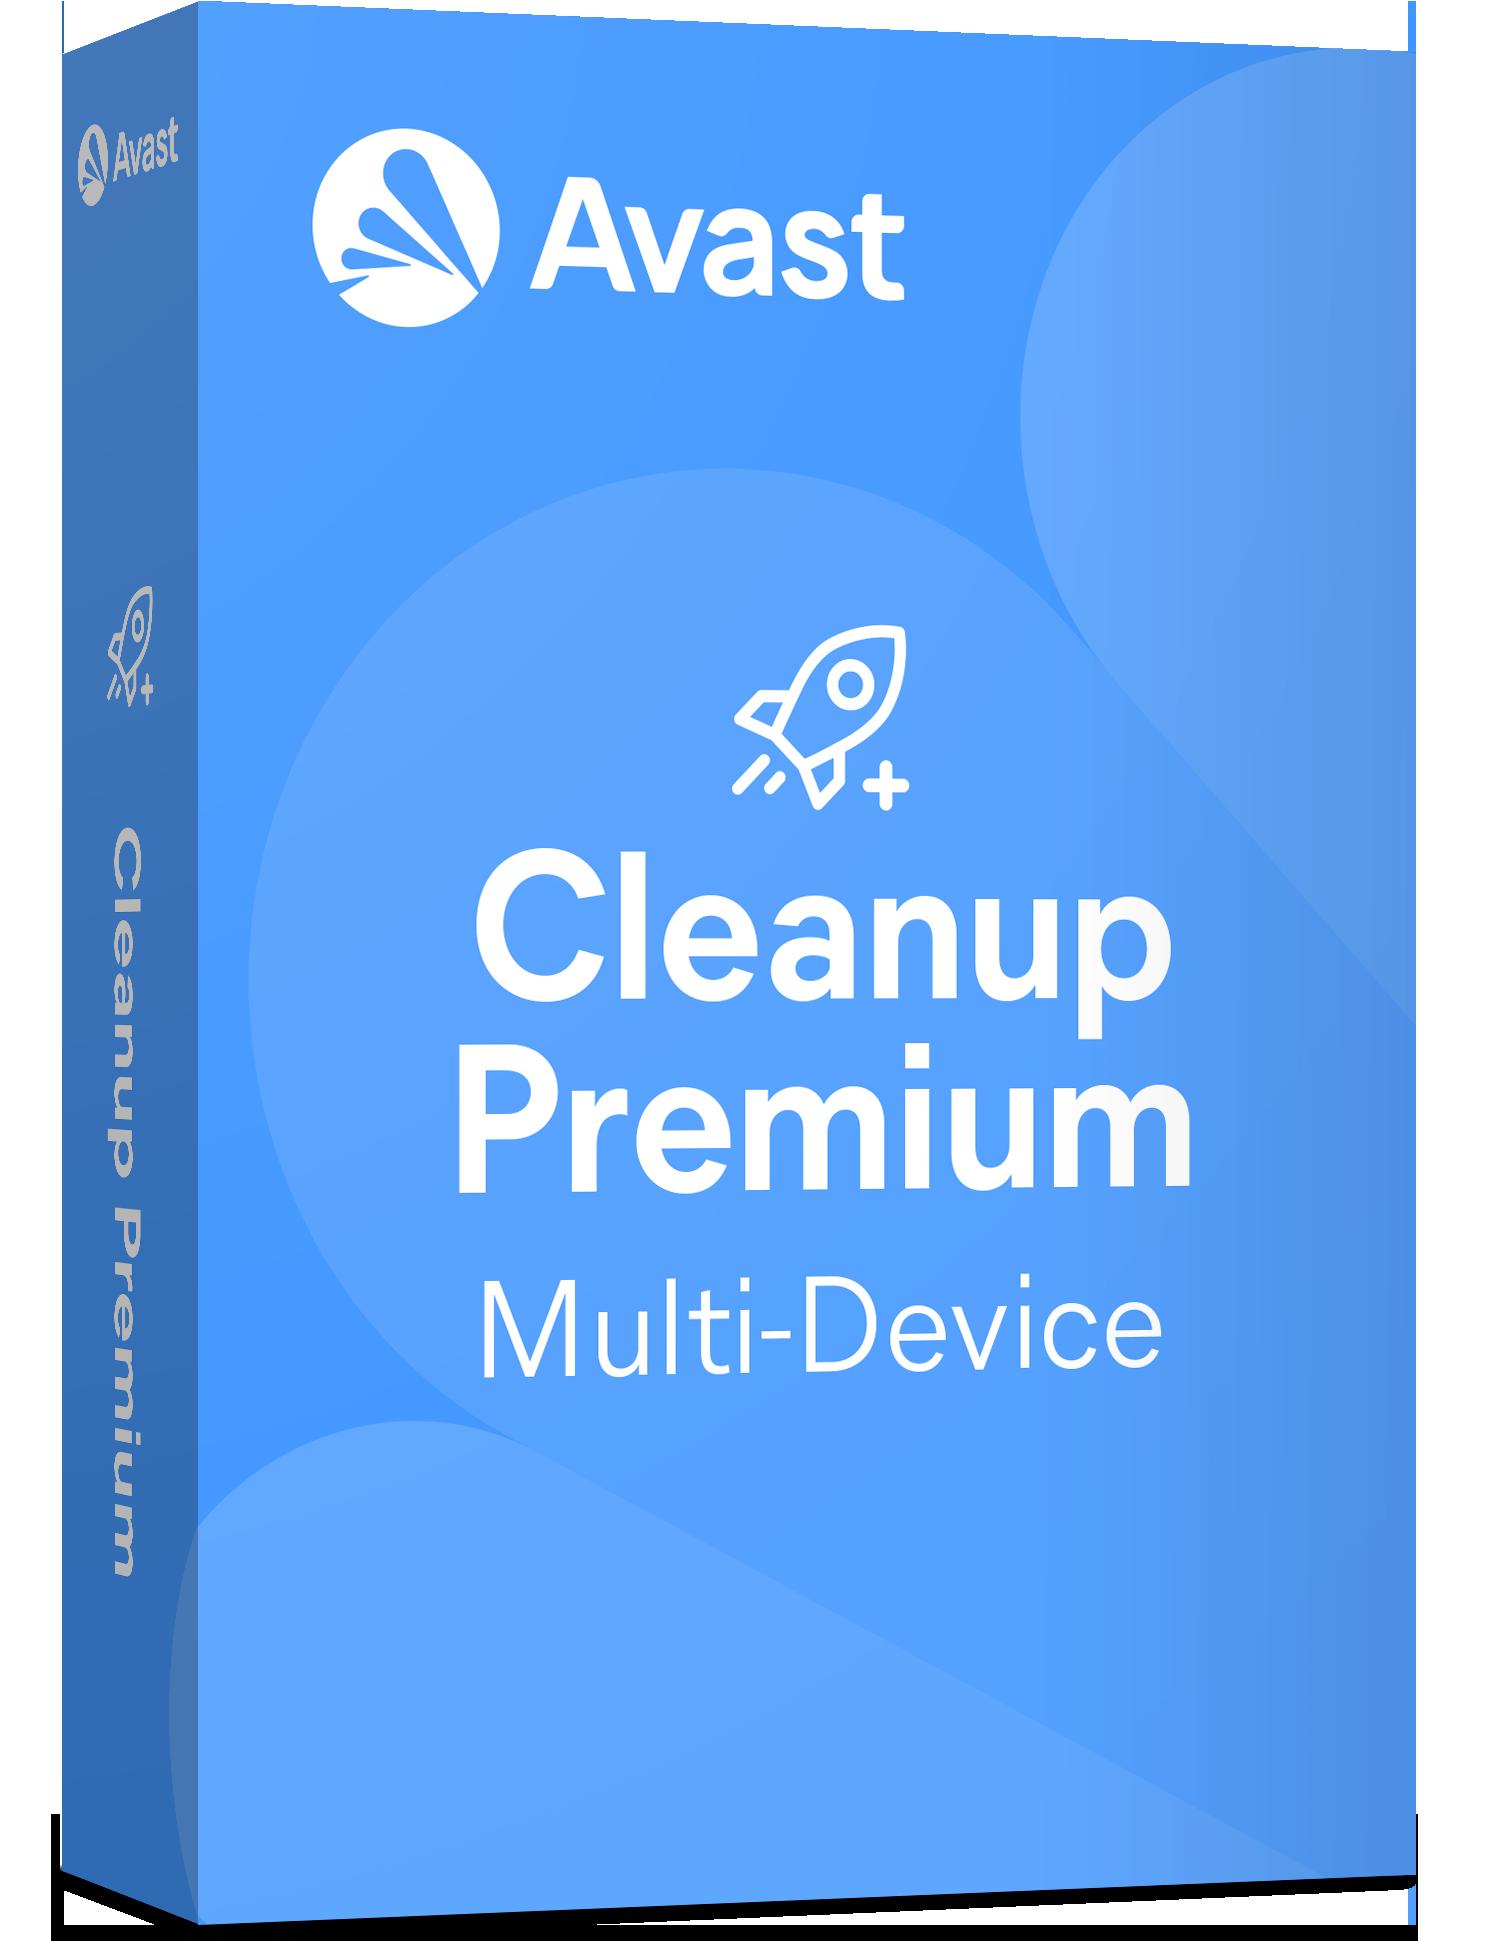 Avast Cleanup Premium Multi-Device